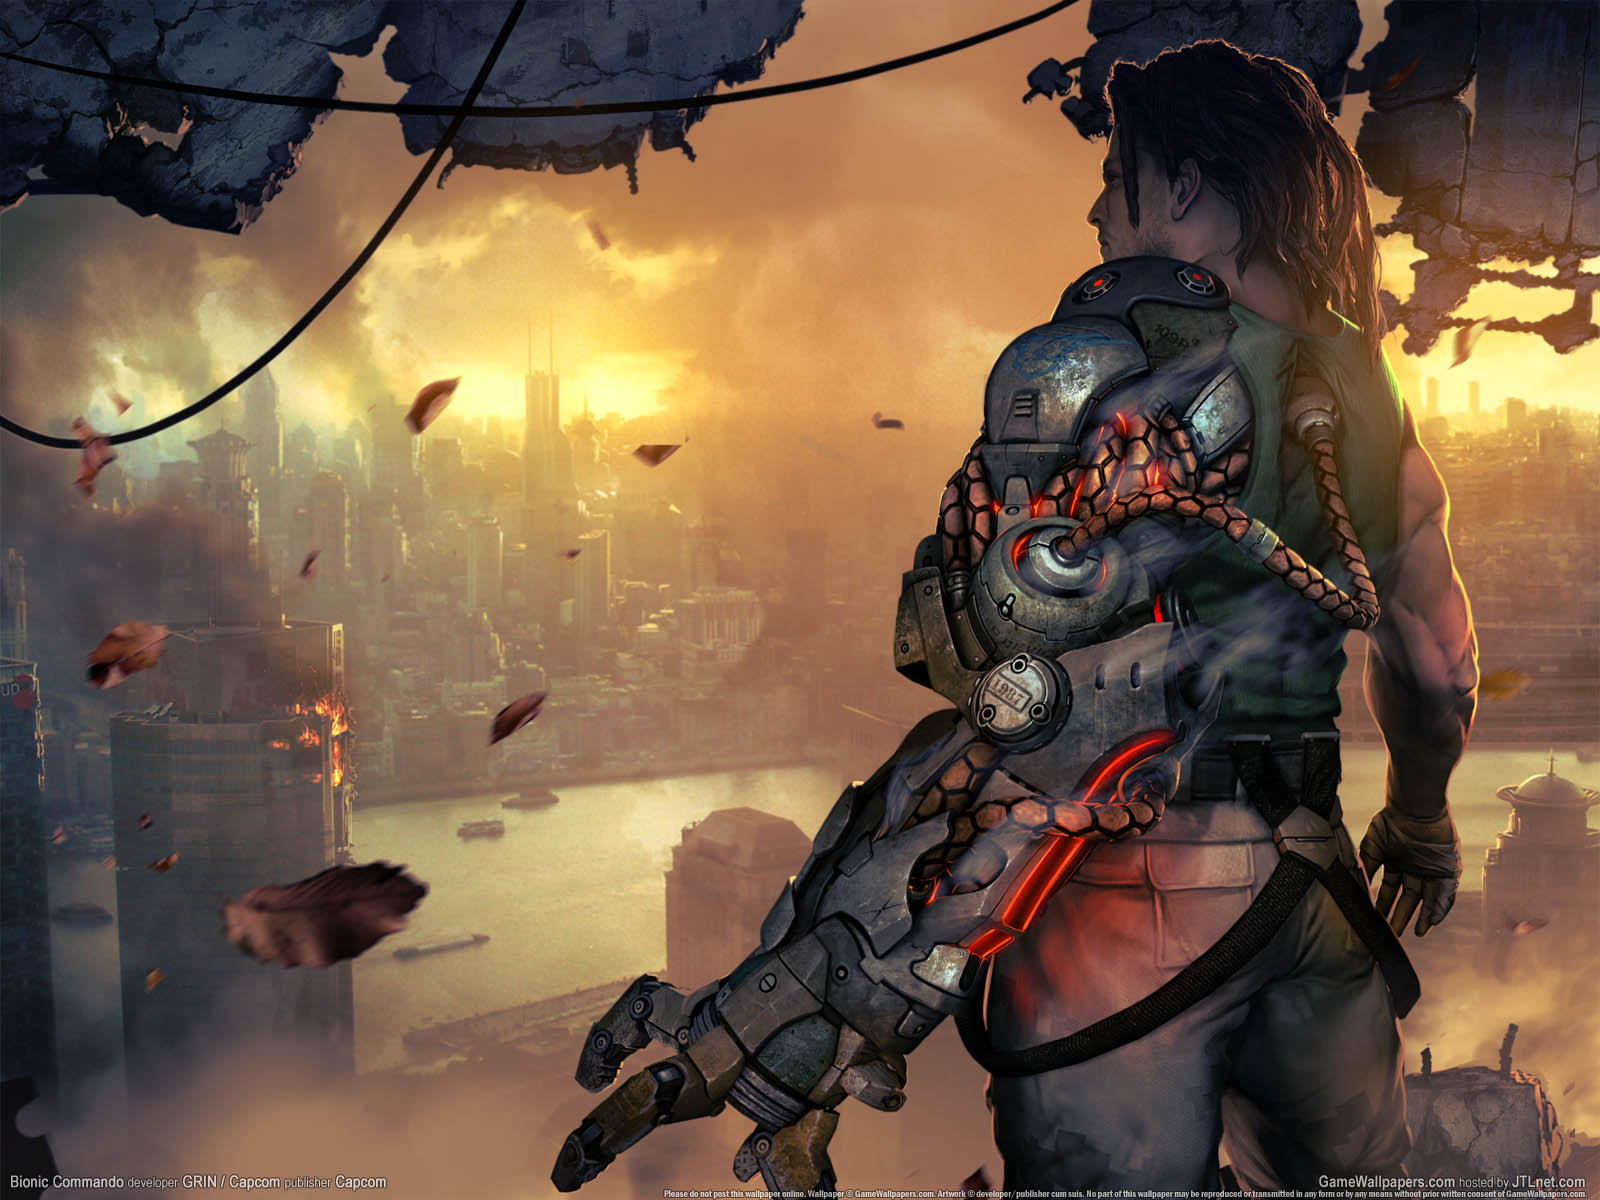 Bionic Commandoνmmer=02 achtergrond  1600x1200